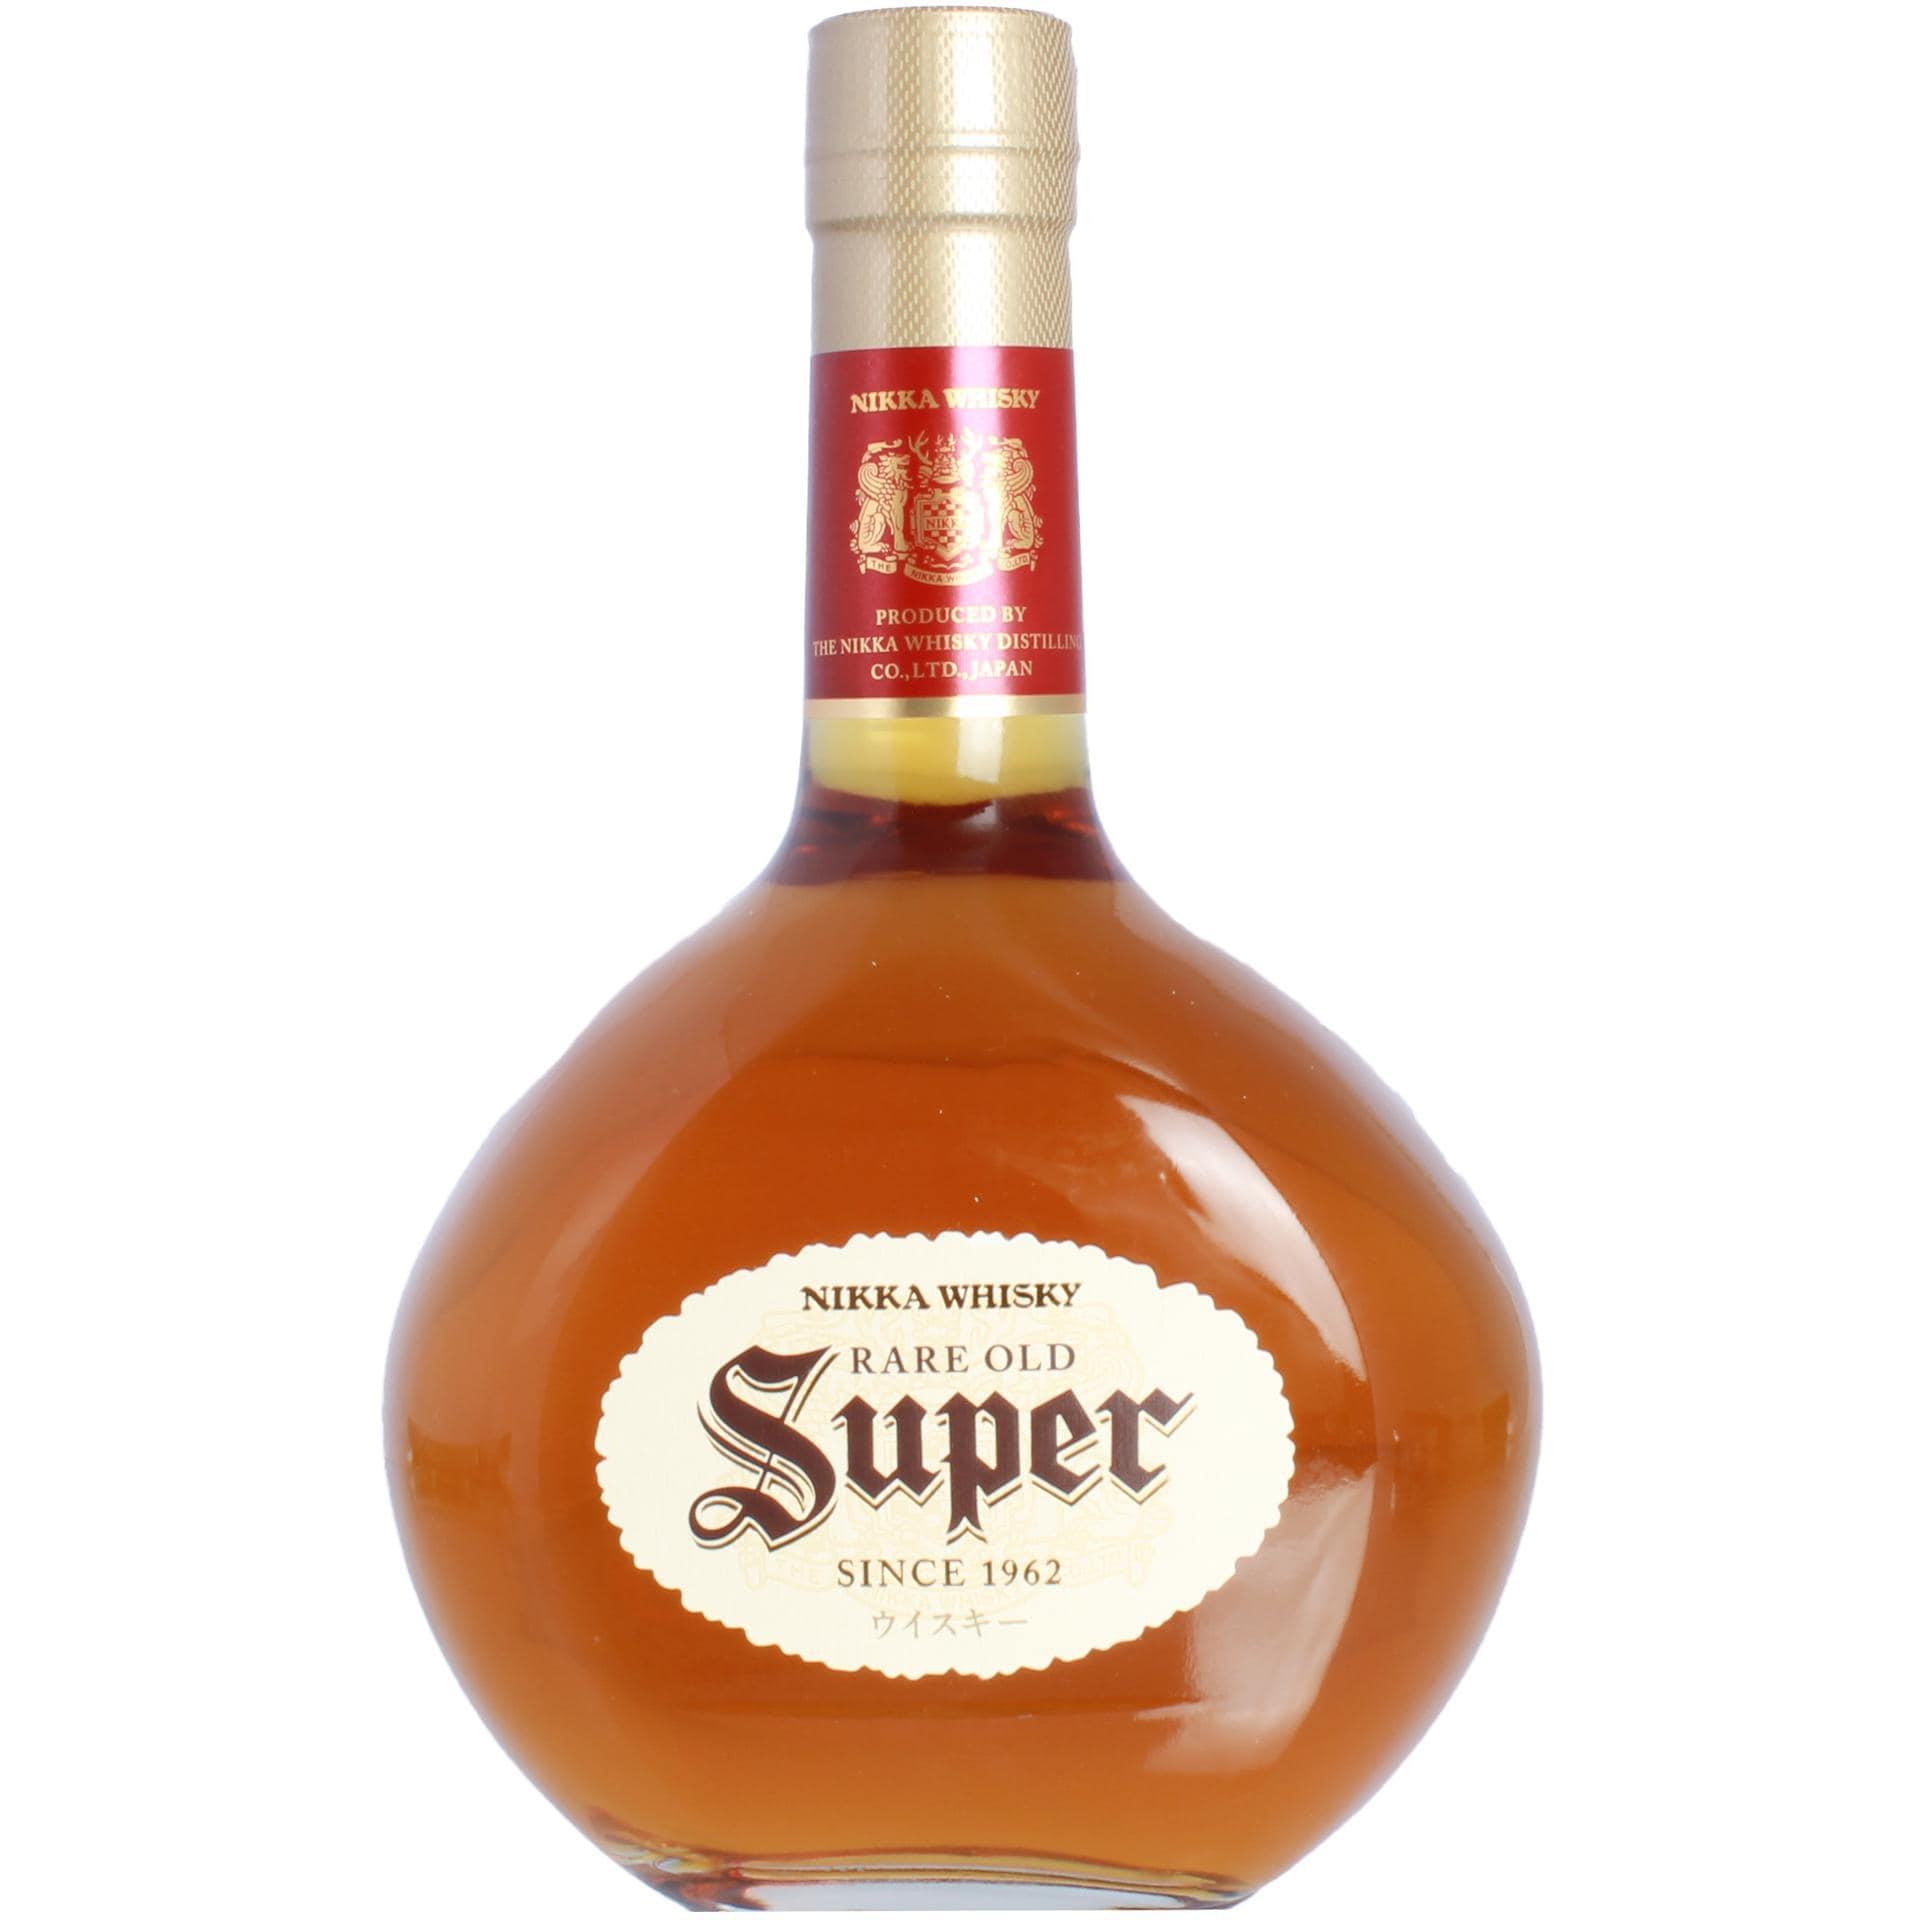 Nikka Whisky Rare Old Super Pure Malt 0,7l